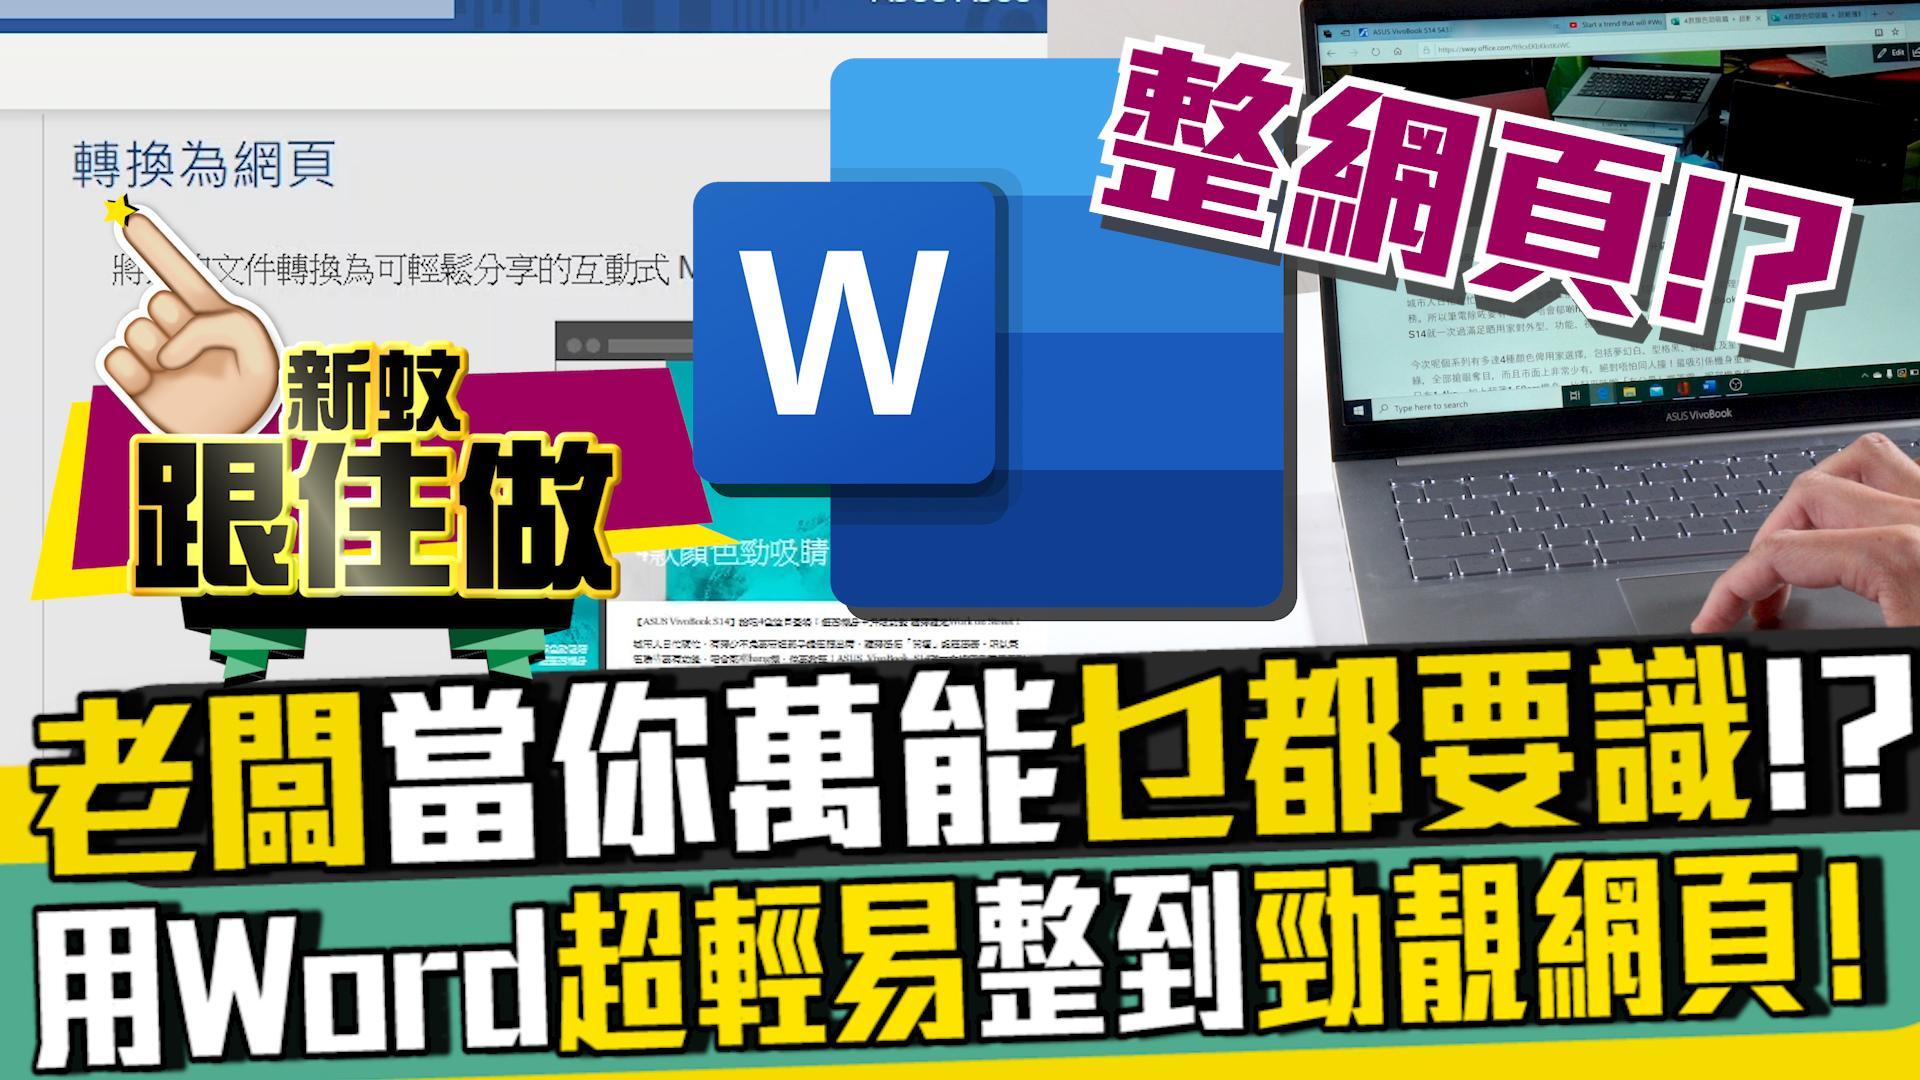 WORD整網頁!?用Word 超輕易整到勁靚網頁! Word Scan相自動打字!Microsoft Word 教學!